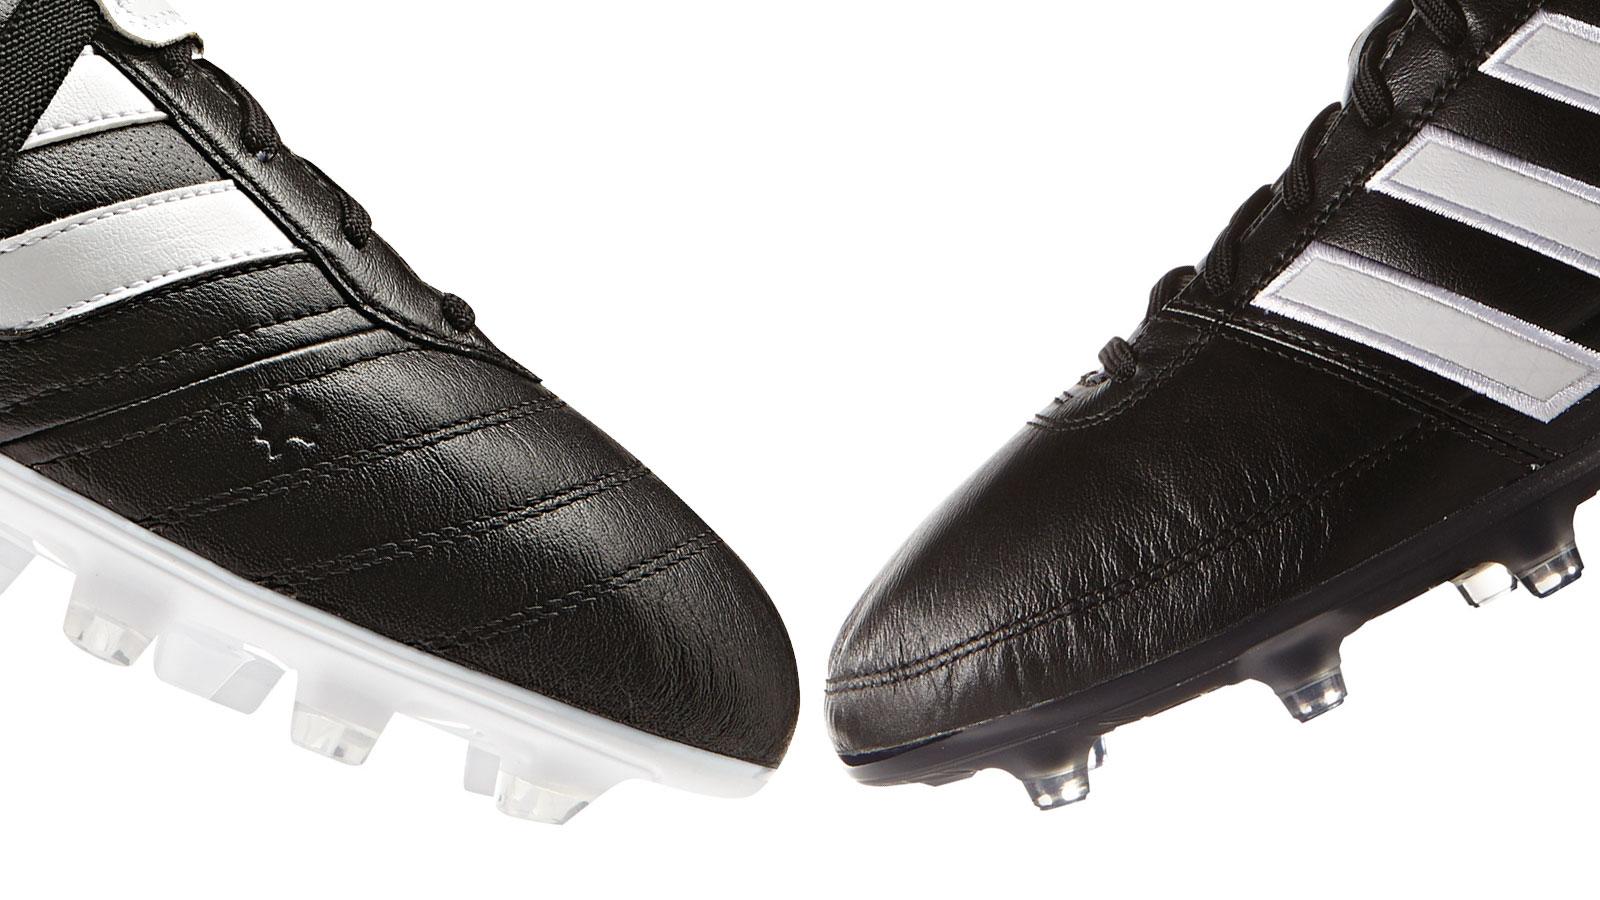 K-Leder Material im Adidas Gloro 16.1 FG